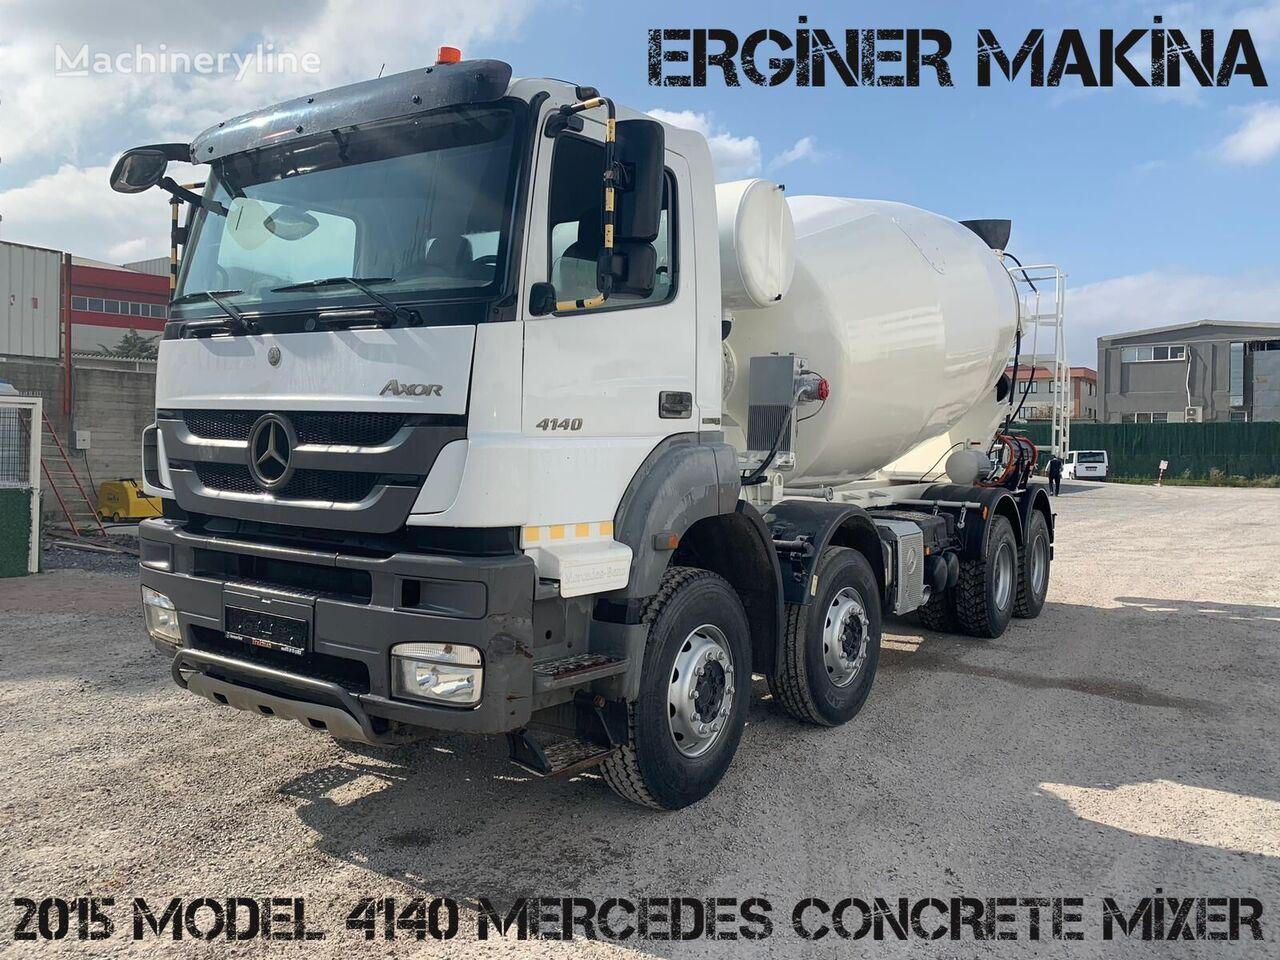 Stetter 2015 MODEL 4140 MERCEDES MİXER on chassis MERCEDES-BENZ 4140 MİXER READY  concrete mixer truck